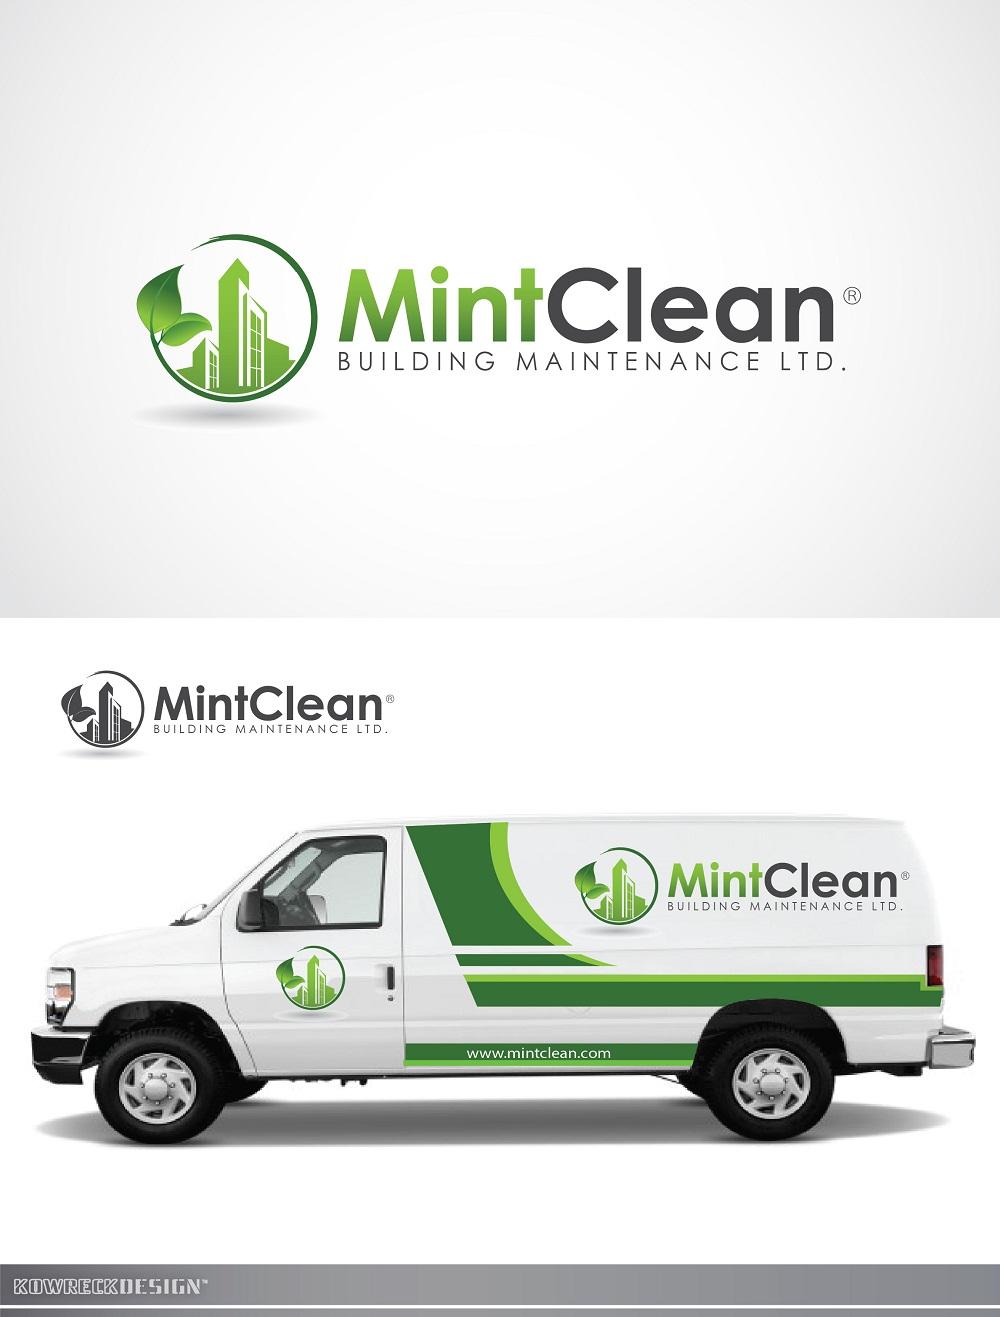 Logo Design by kowreck - Entry No. 131 in the Logo Design Contest MintClean Building Maintenance Ltd. Logo Design.